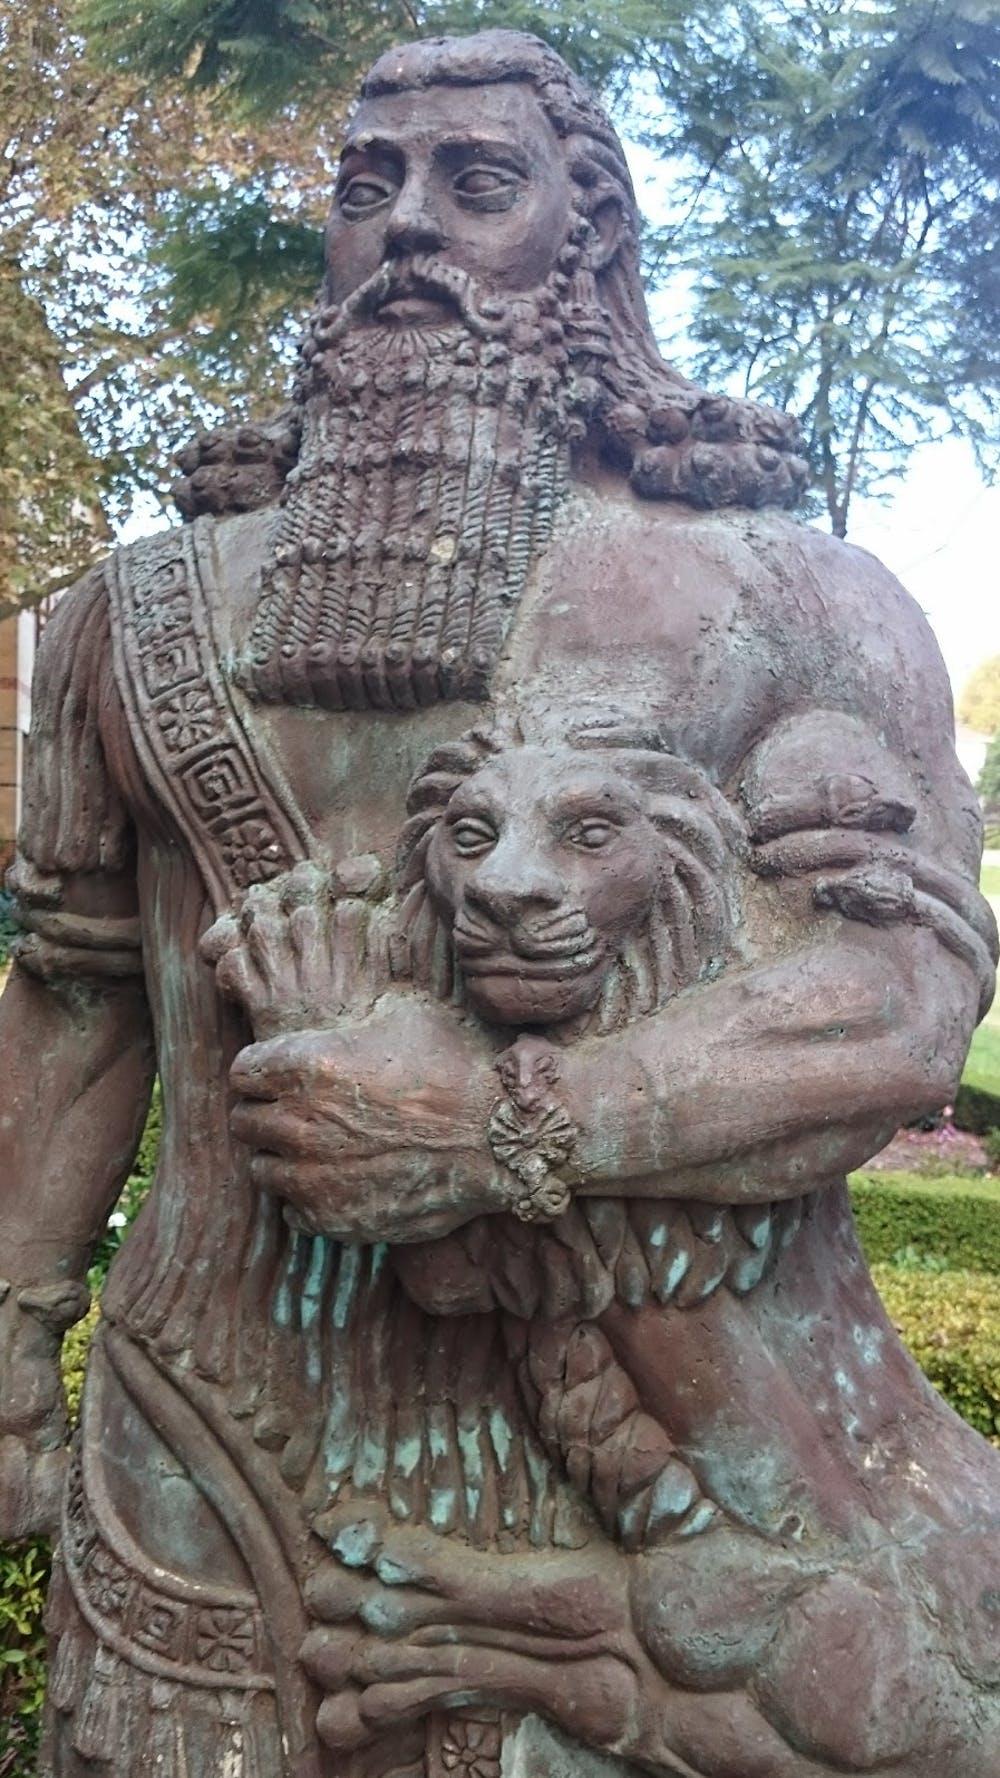 Legendary Heroes in History - Gilgamesh